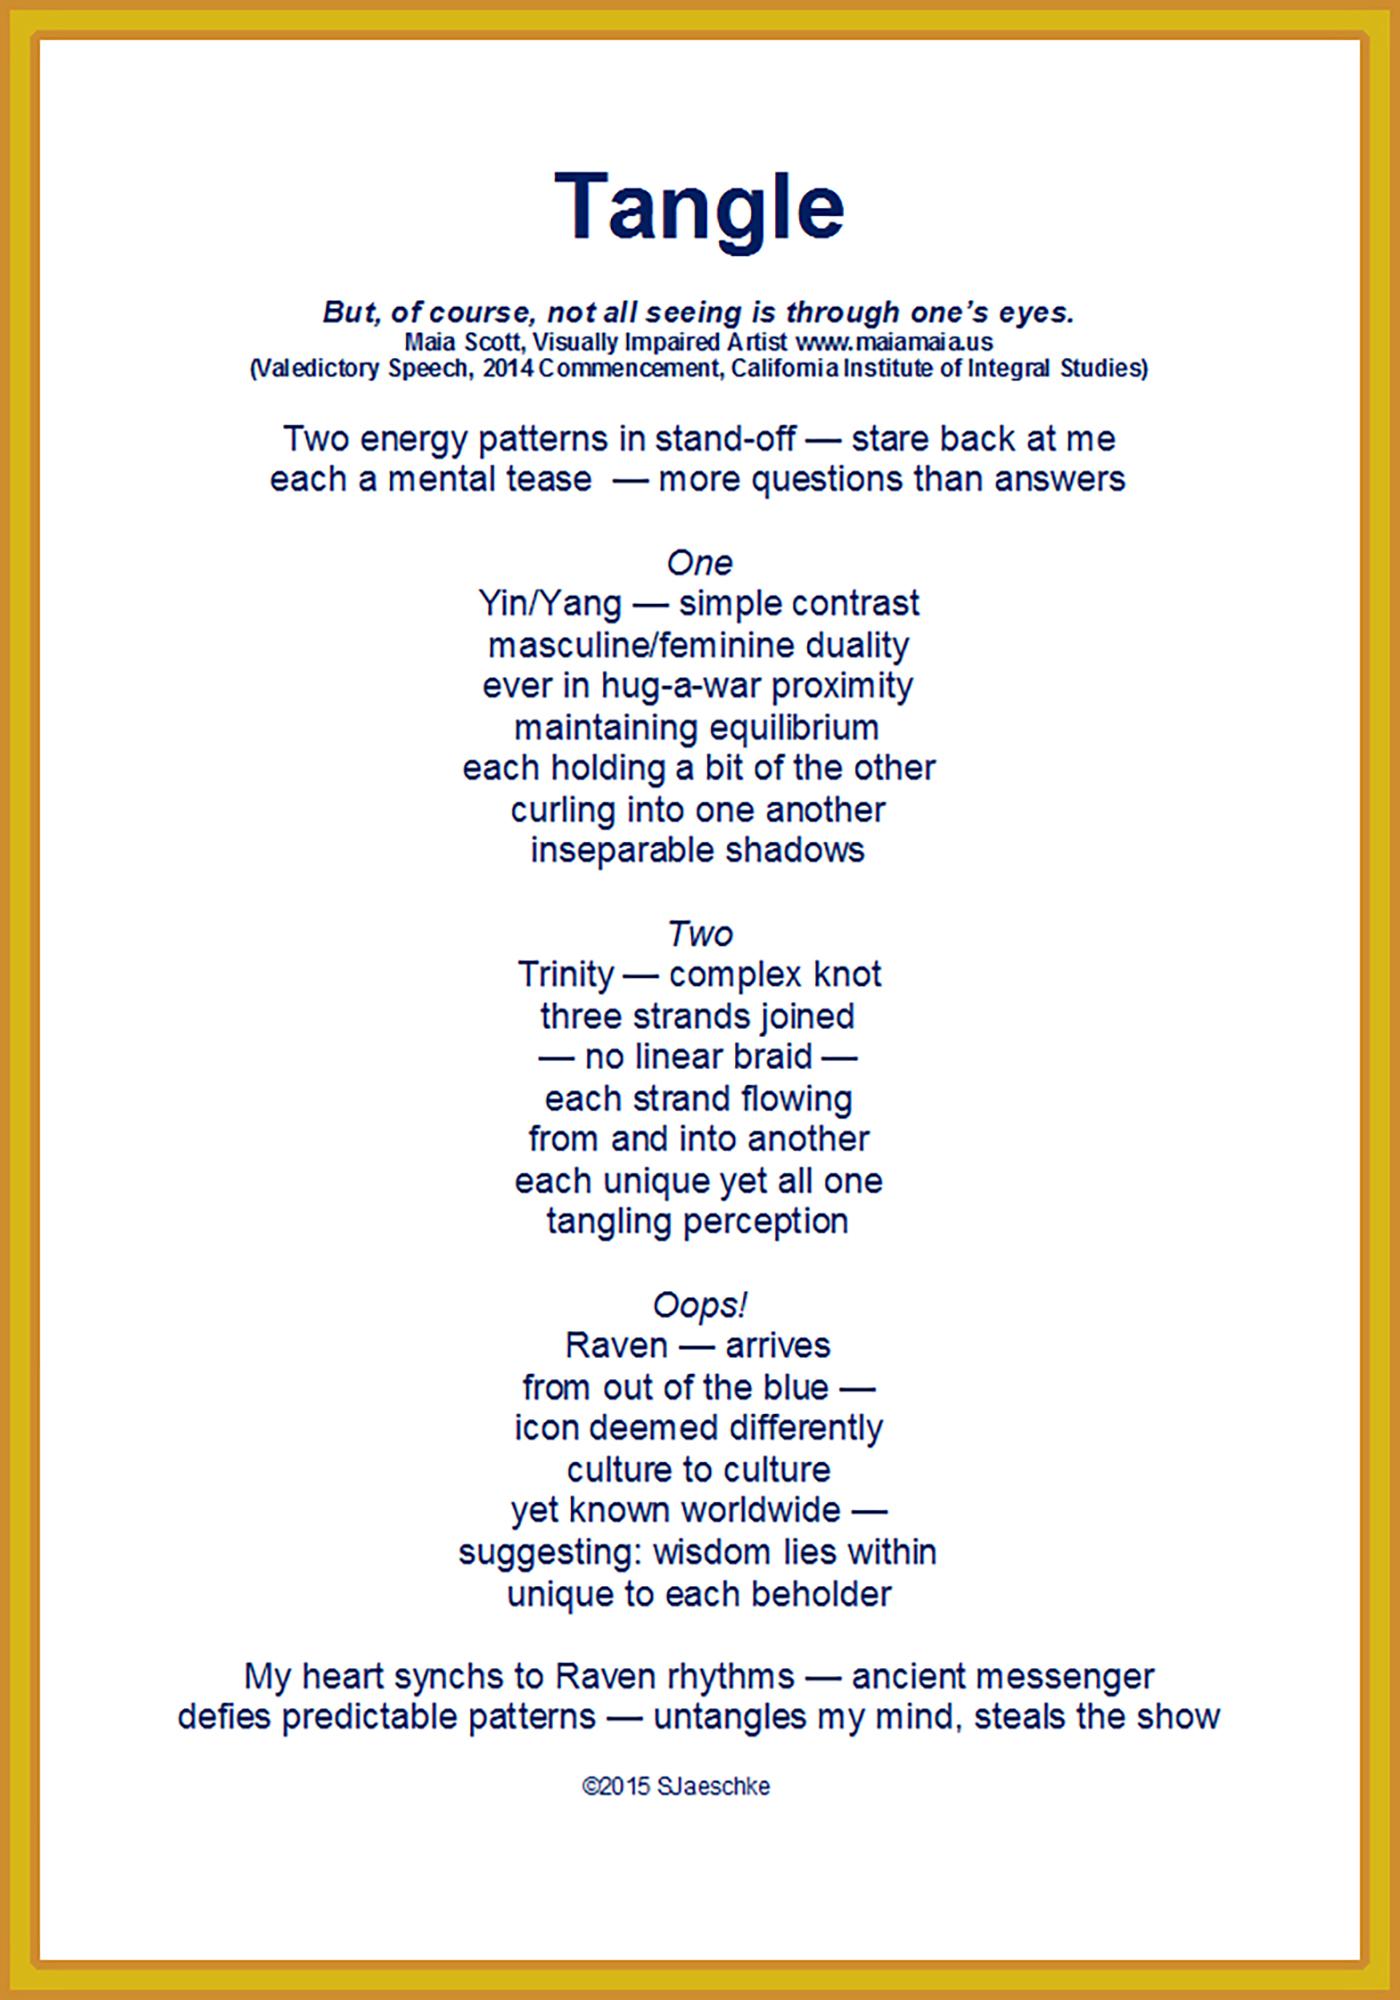 Post_2015-09-17_Poem_Tangle_revised